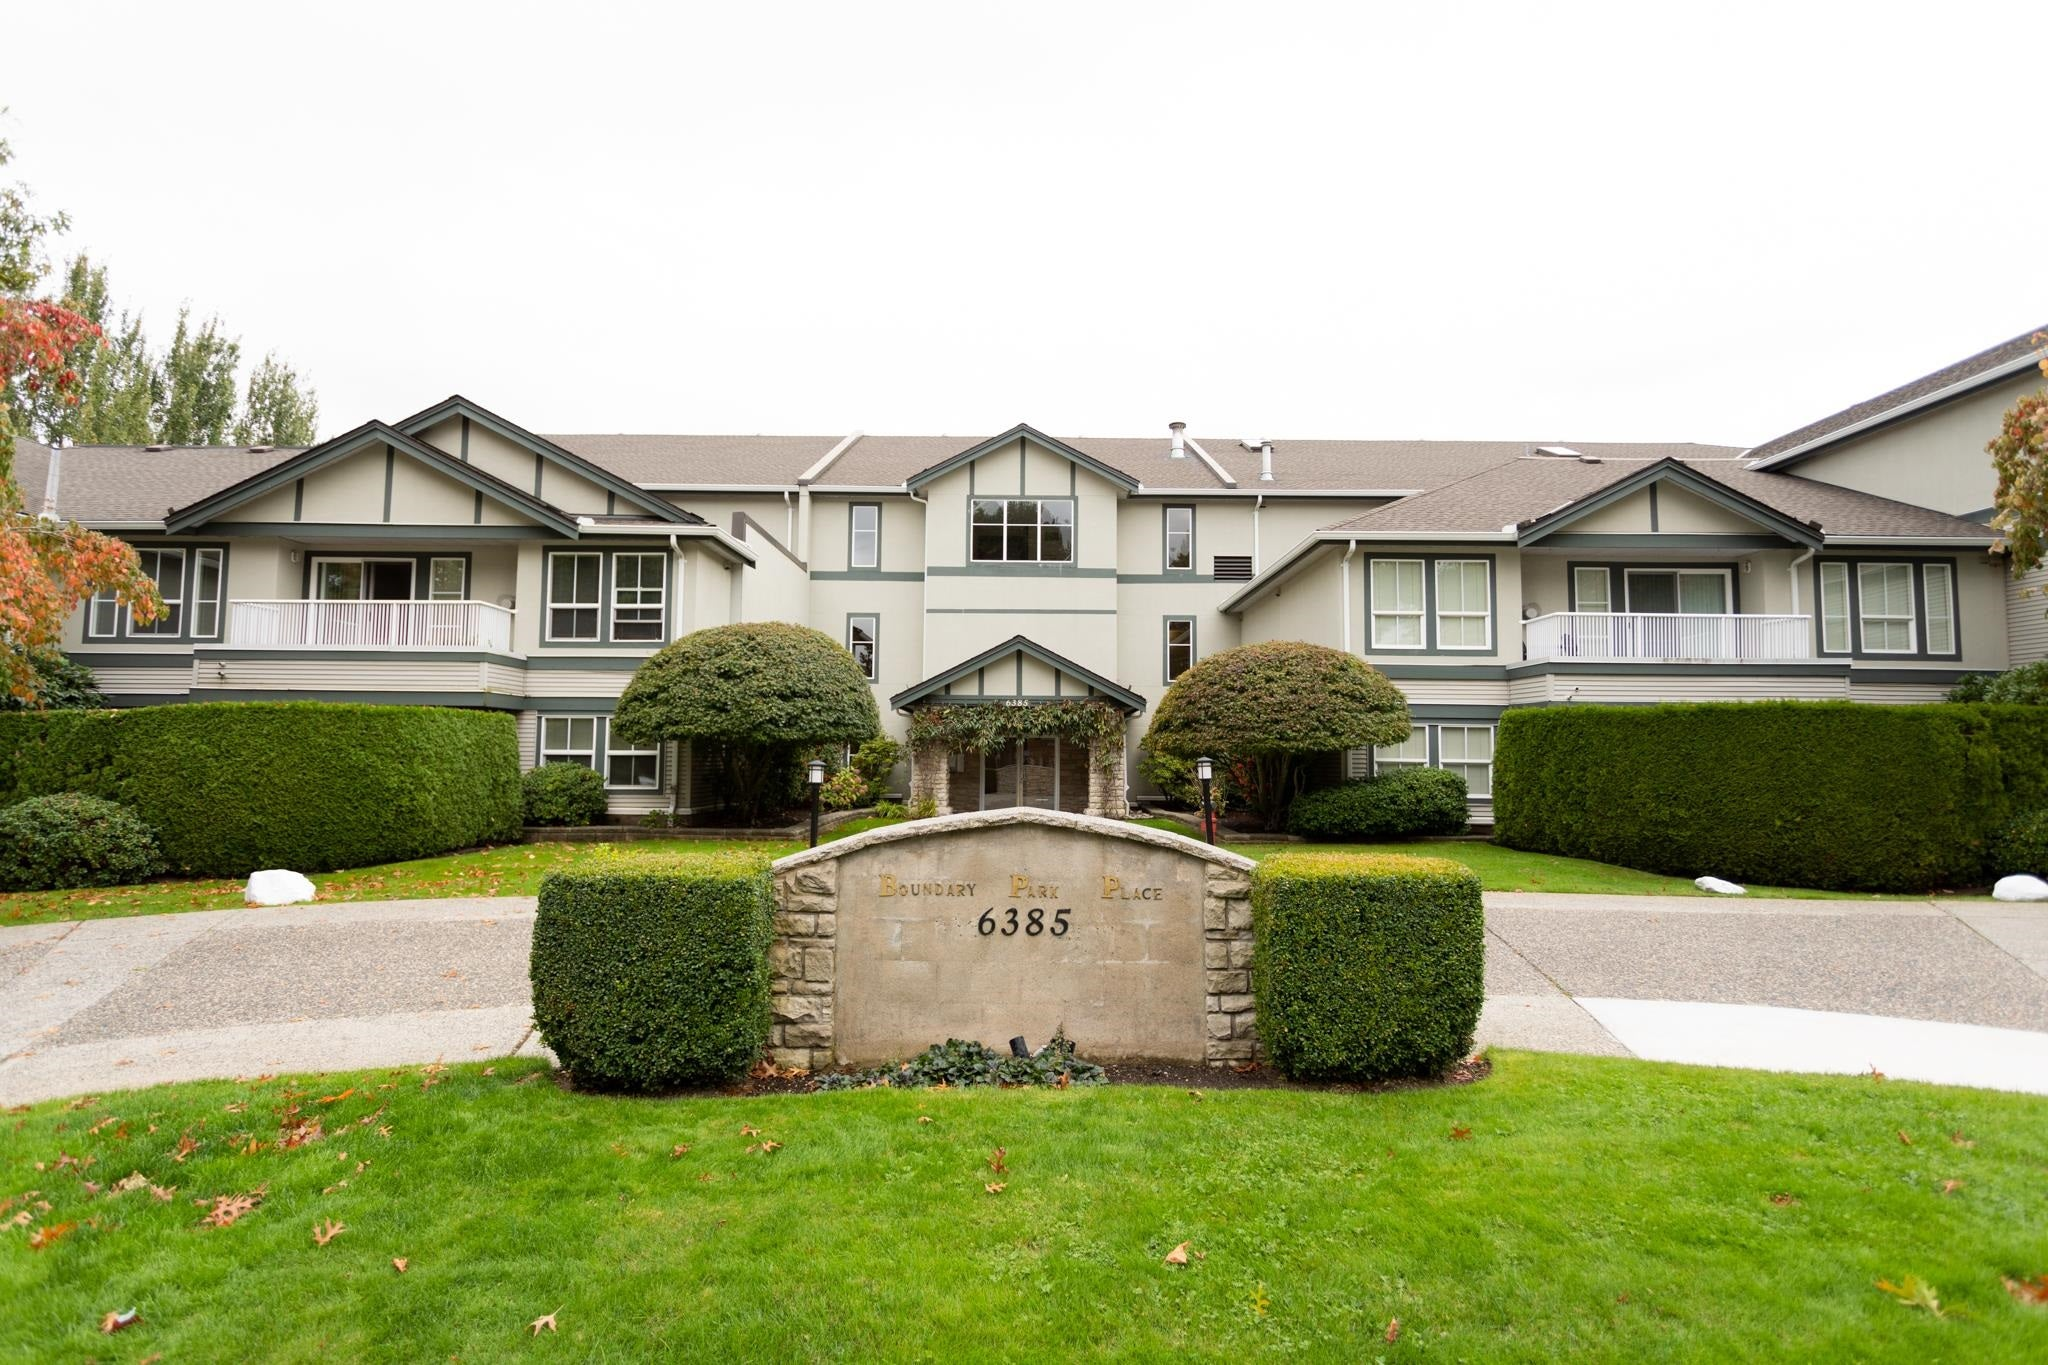 205 6385 121 STREET - Panorama Ridge Apartment/Condo for sale, 2 Bedrooms (R2622852) - #1